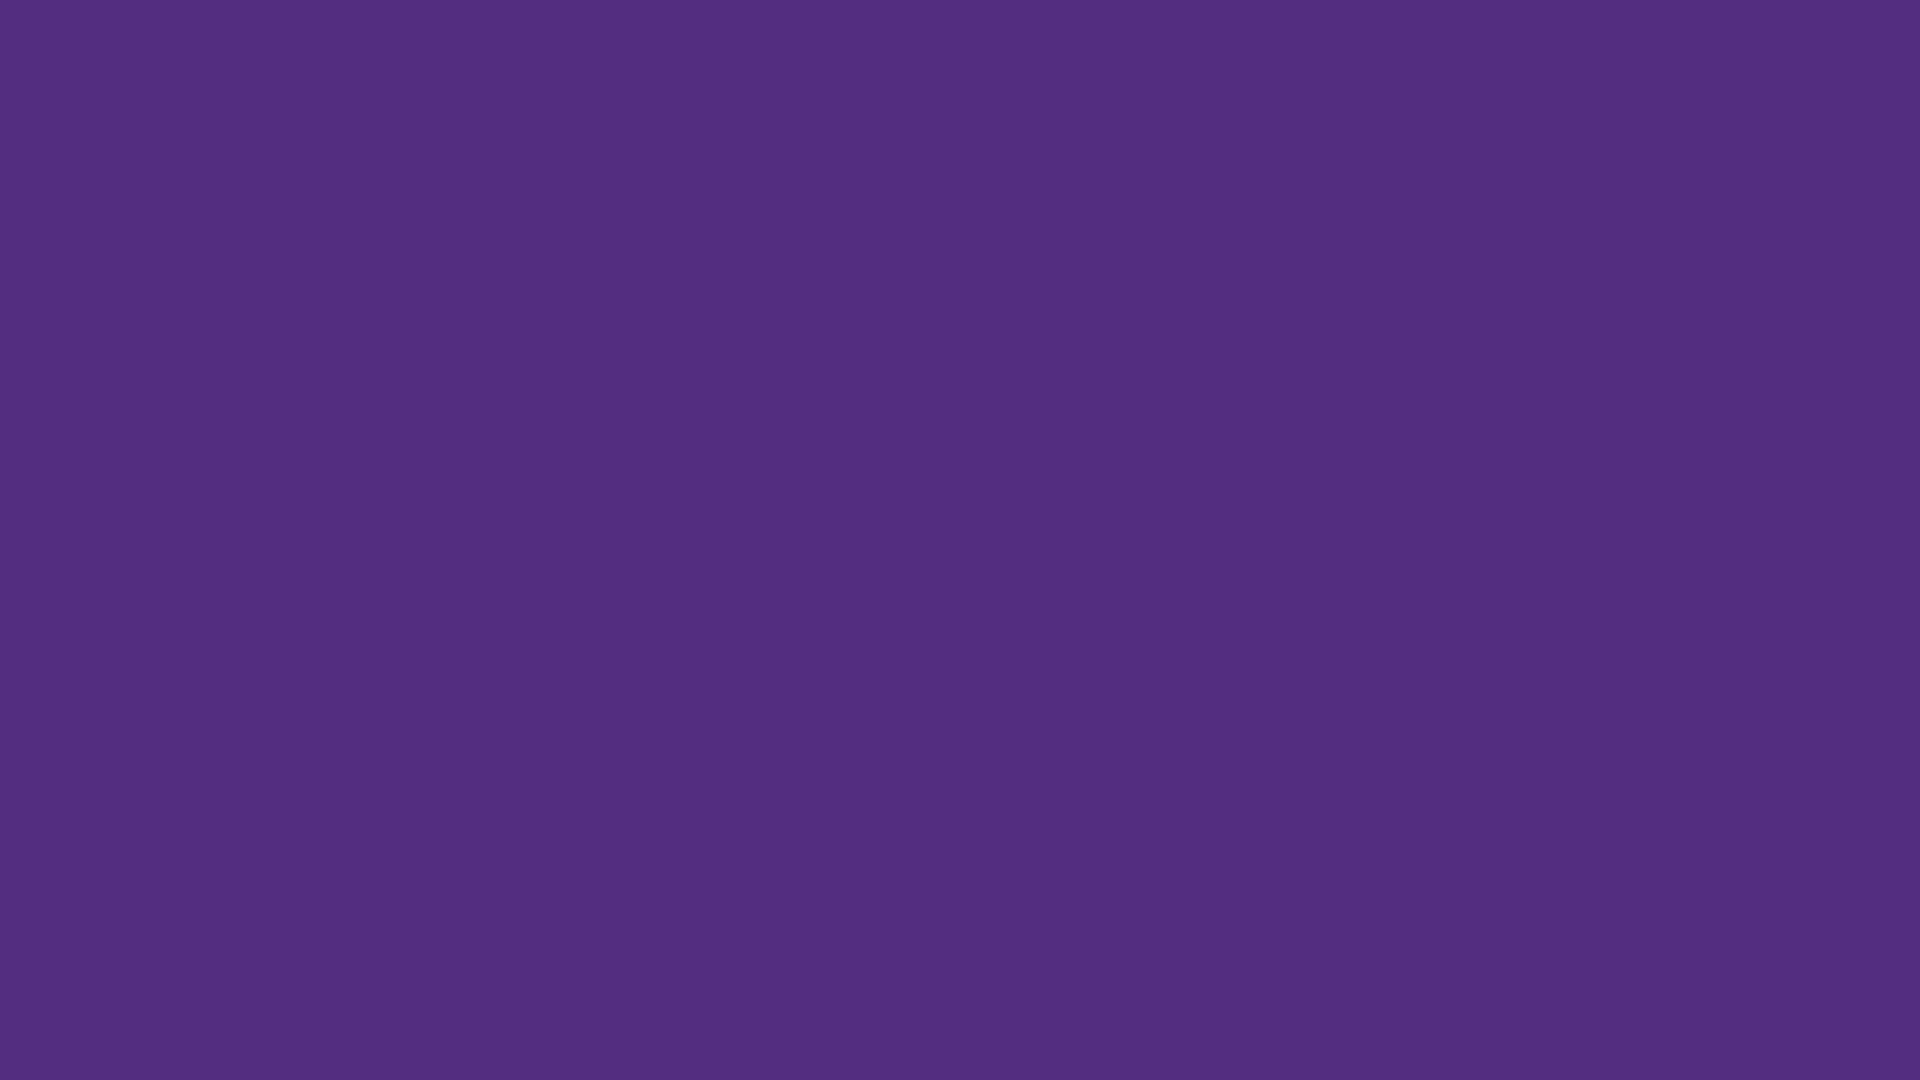 1920x1080 Regalia Solid Color Background